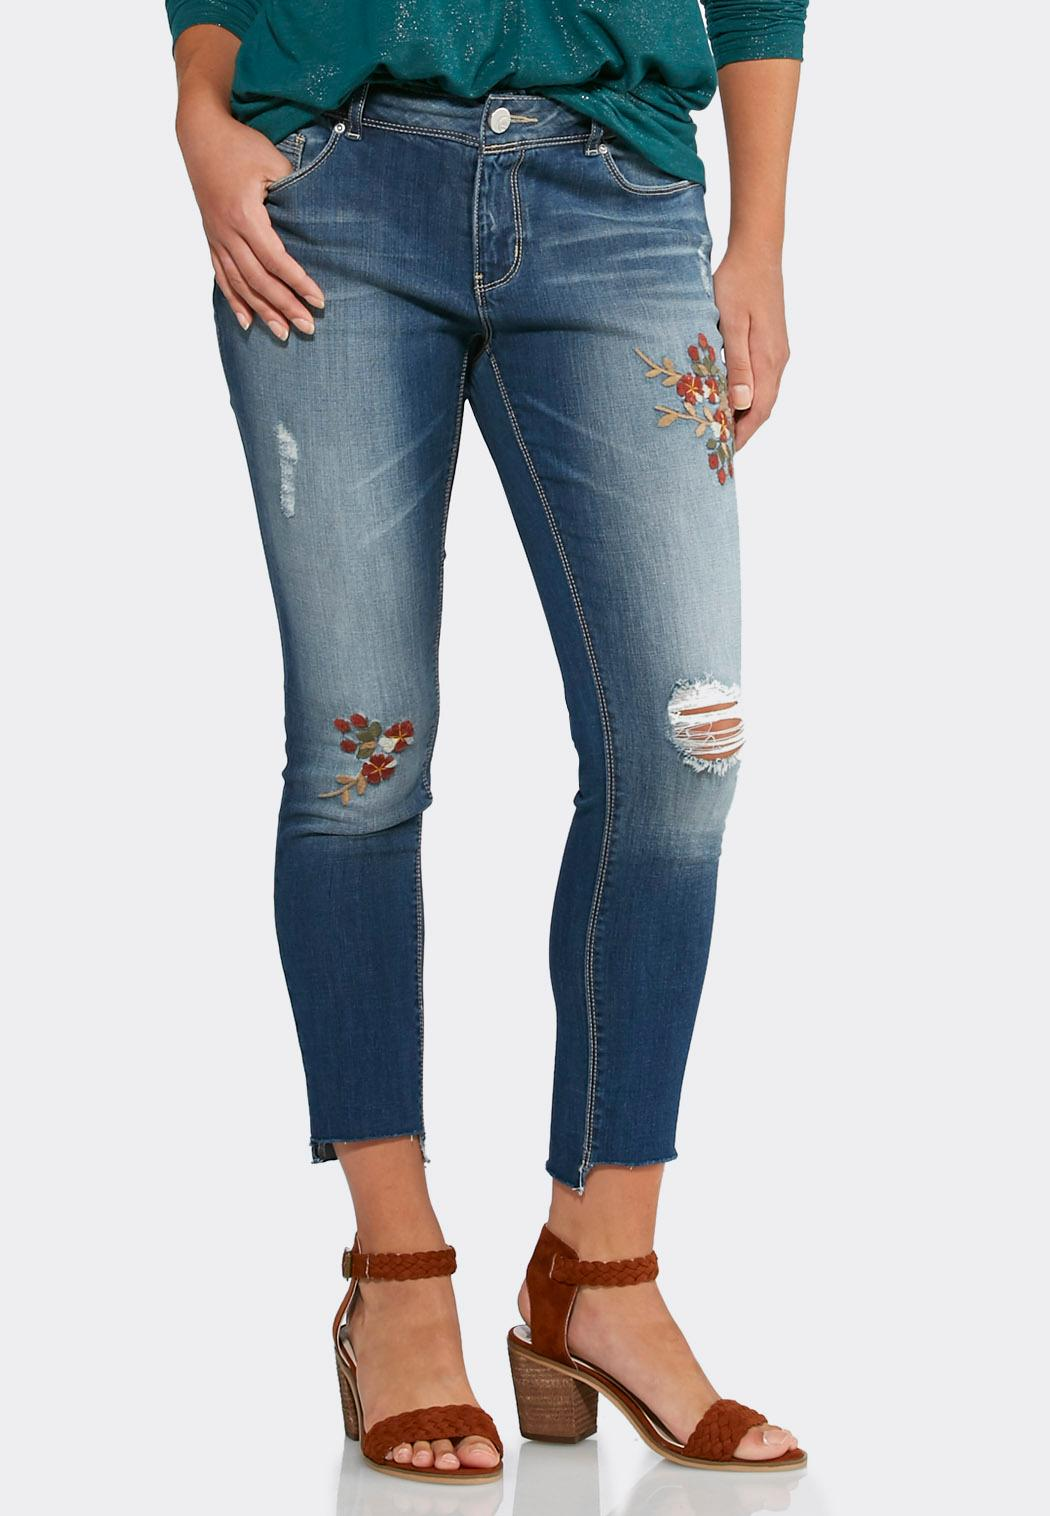 Shop Women's Pants in Petite sizes at stilyaga.tk Find comfortable styles of Slim, Straight, Boot-cut, Ankle & Capri Pants & Denim Jeans for Women.